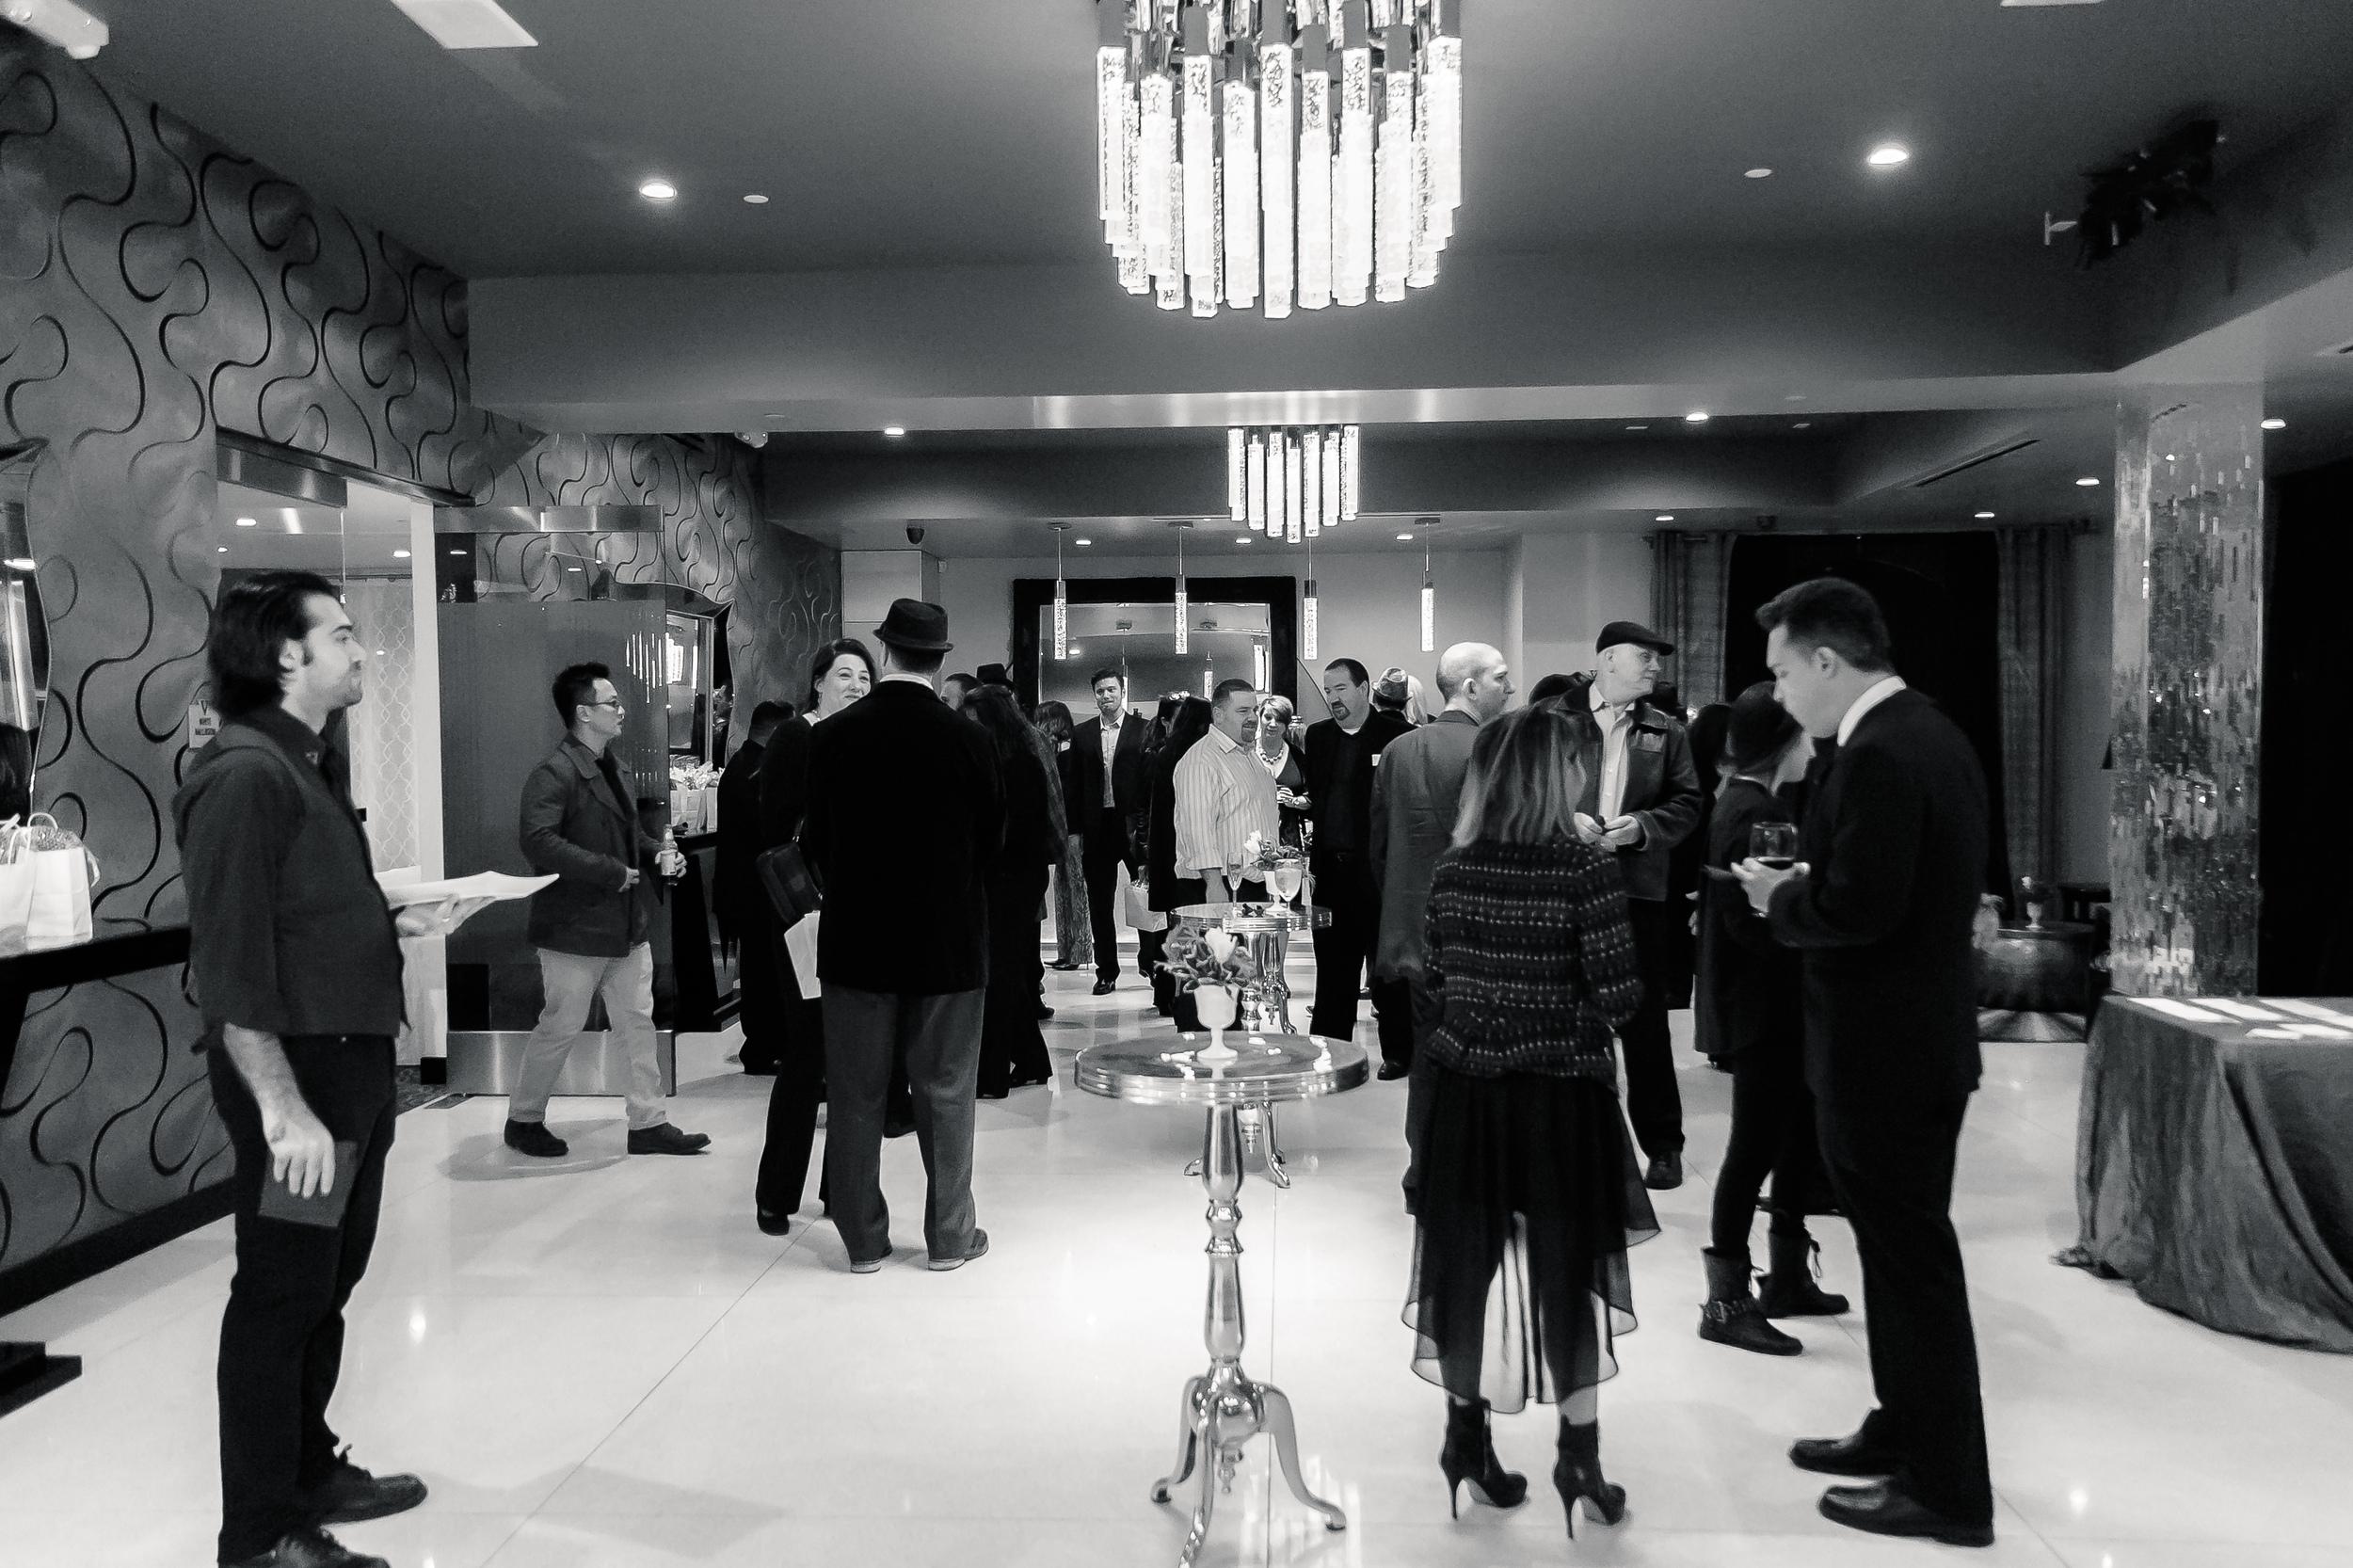 Event Planners Association - Southern California Chapter: 2014 Holiday Party at Vertigo Event Venue